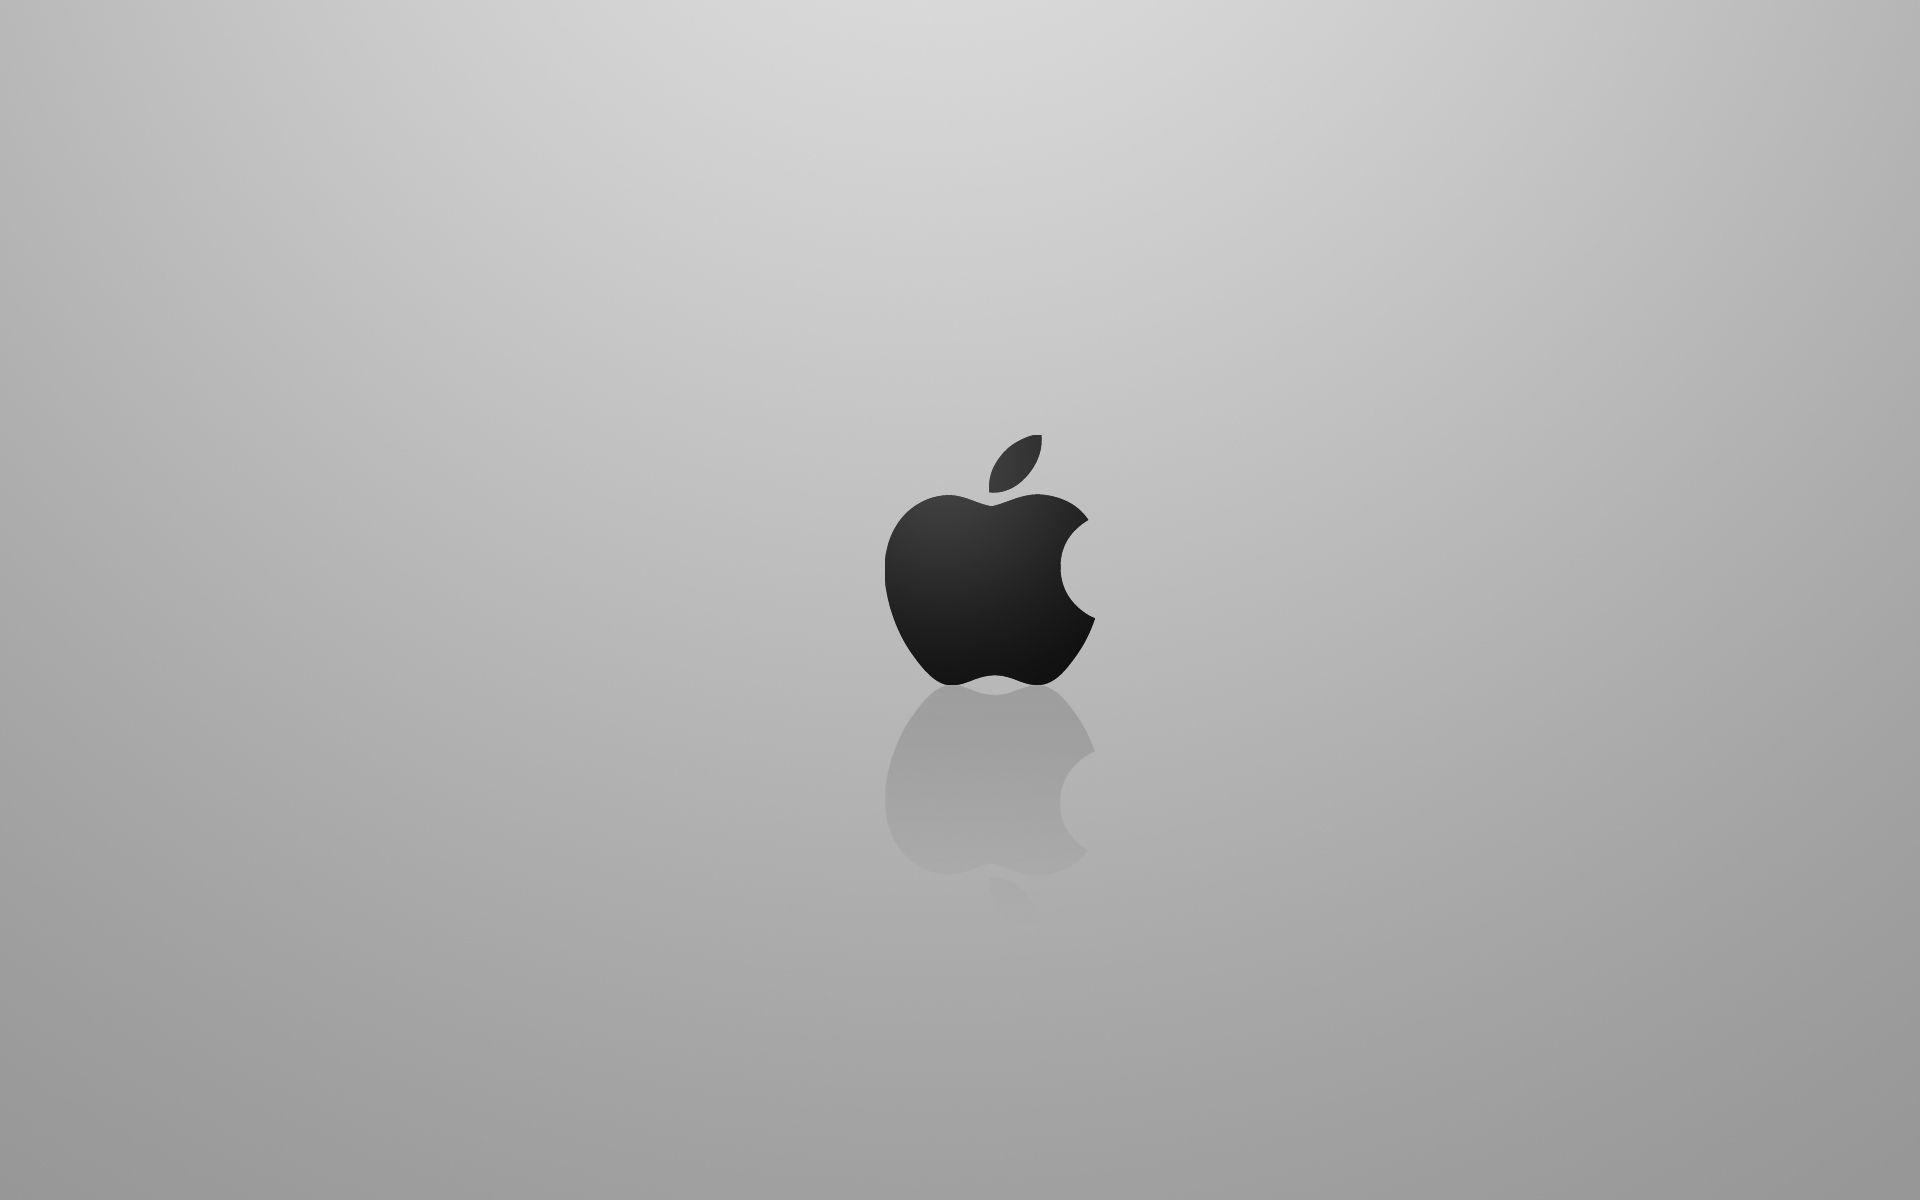 Best Apple Wallpapers Apple Wallpaper Hd Mac 27332 Hd Wallpaper Backgrounds Download